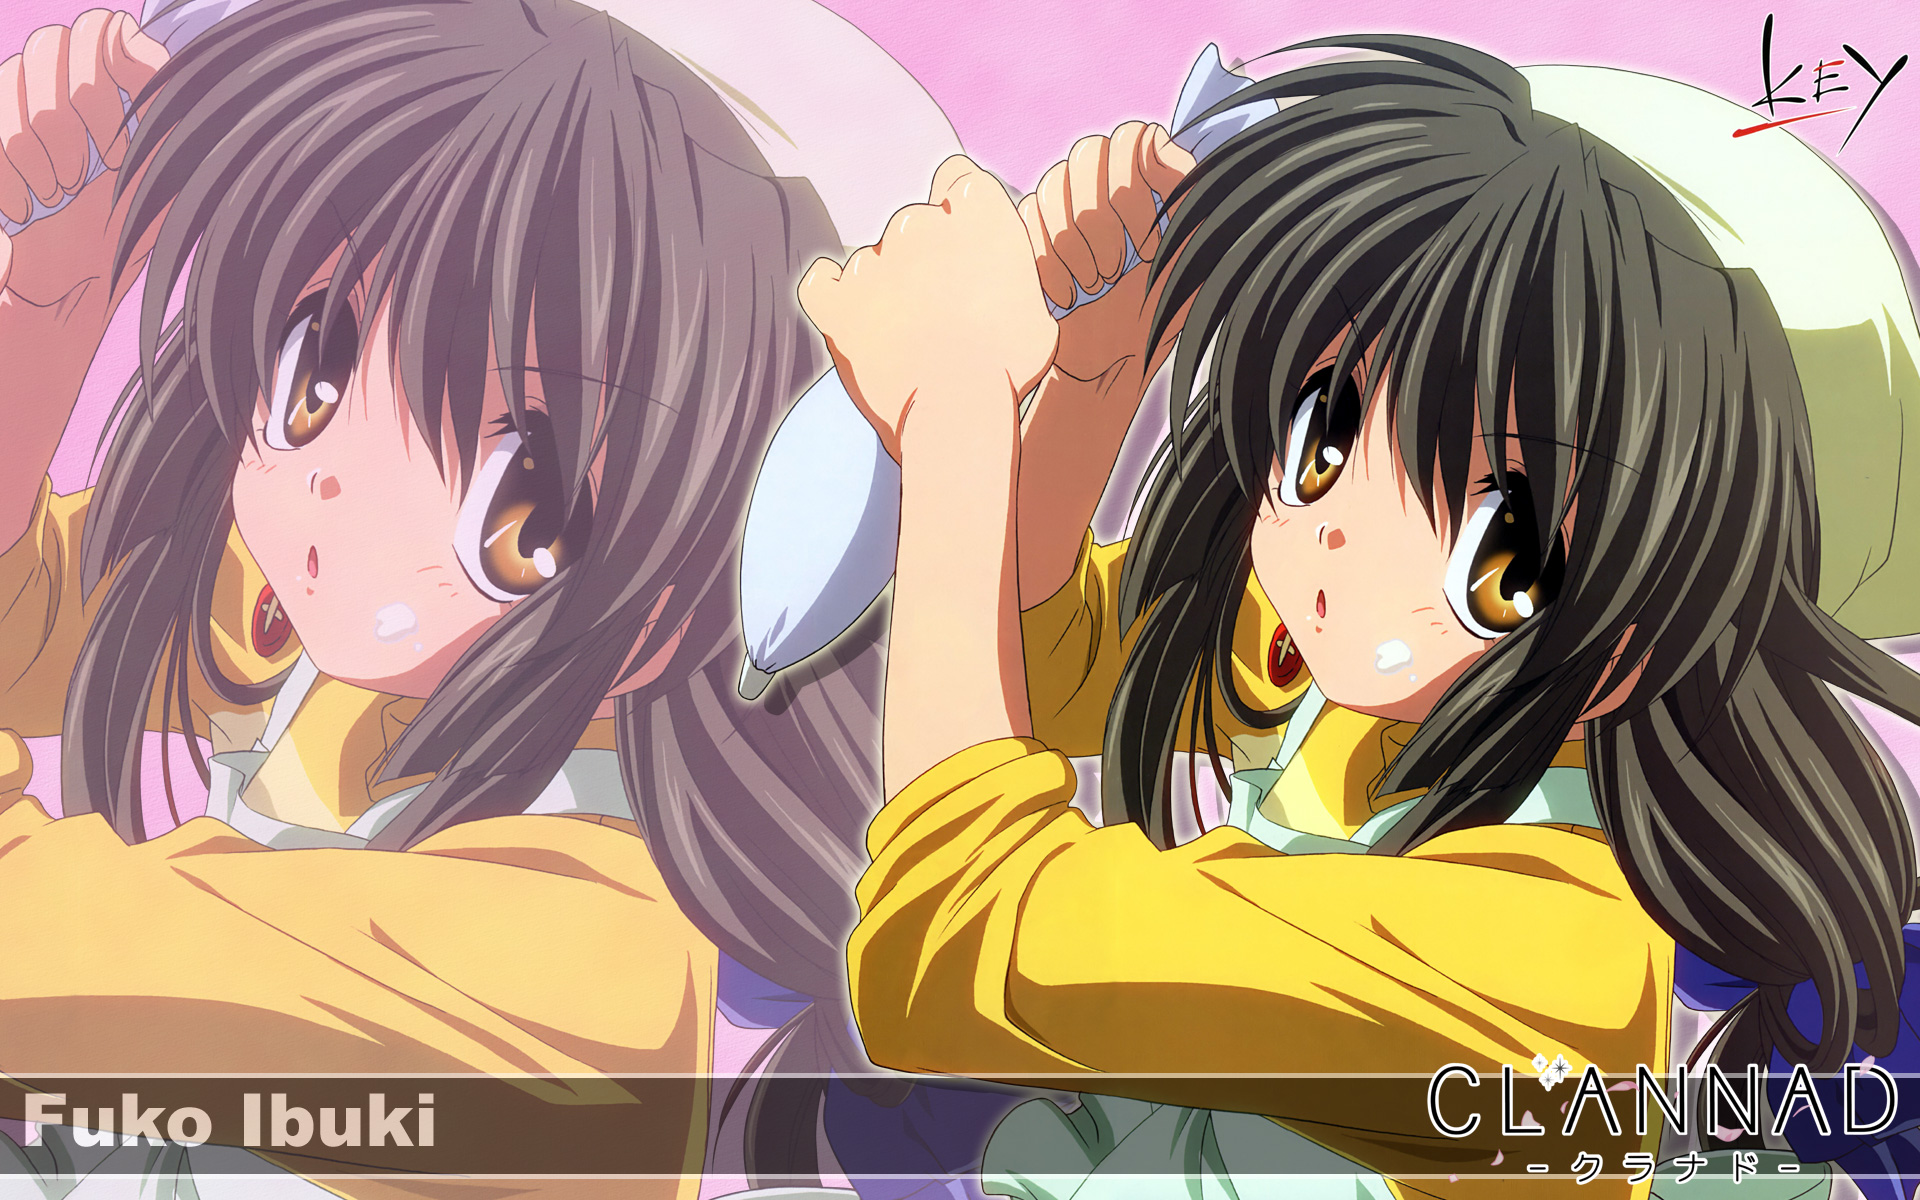 brown_hair clannad ibuki_fuuko key logo long_hair yellow_eyes zoom_layer